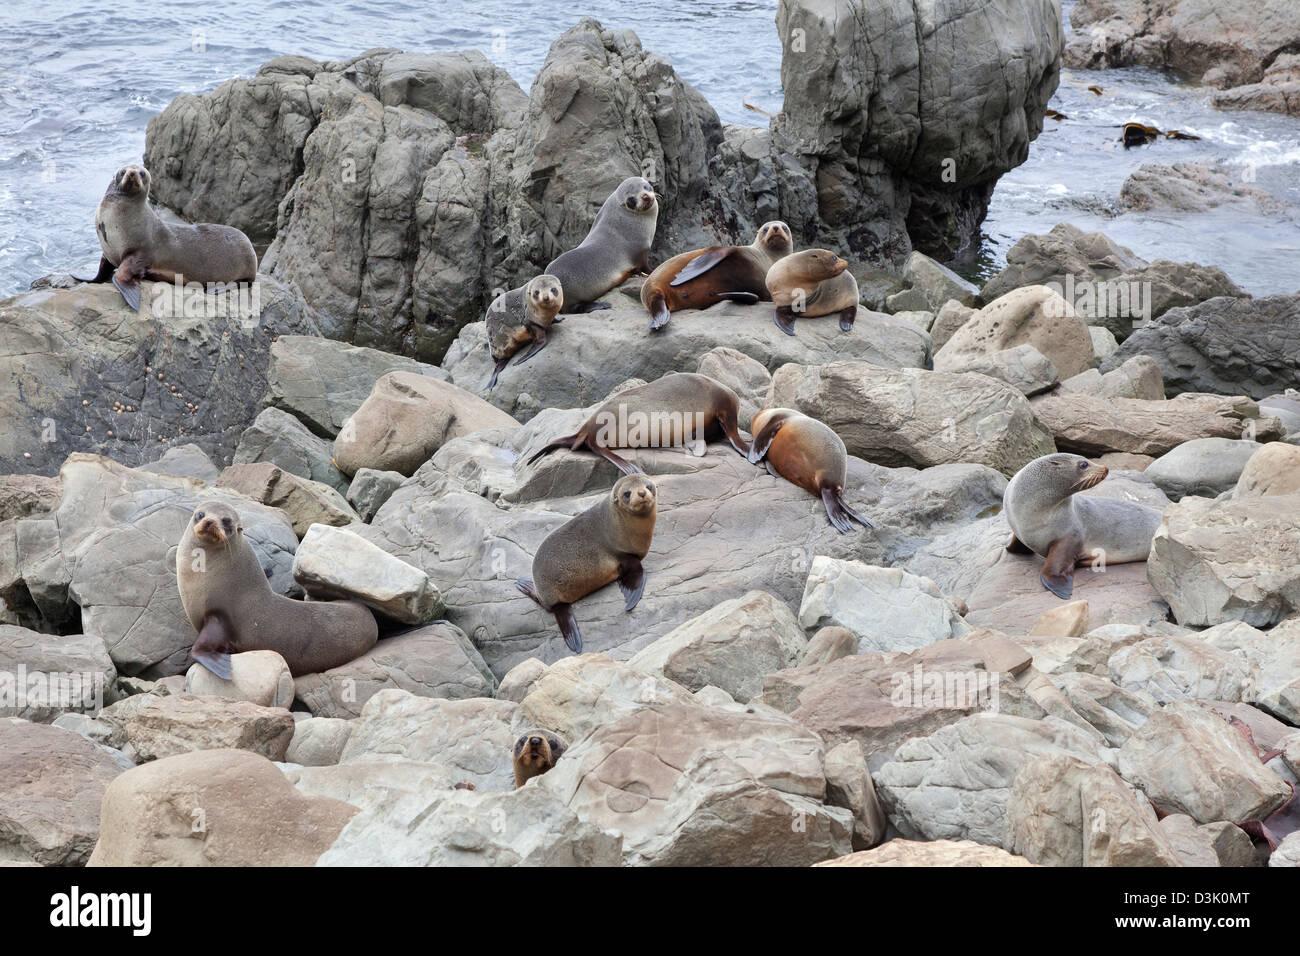 Fur seals on the cliffs near Kaikoura, New Zealand - Stock Image